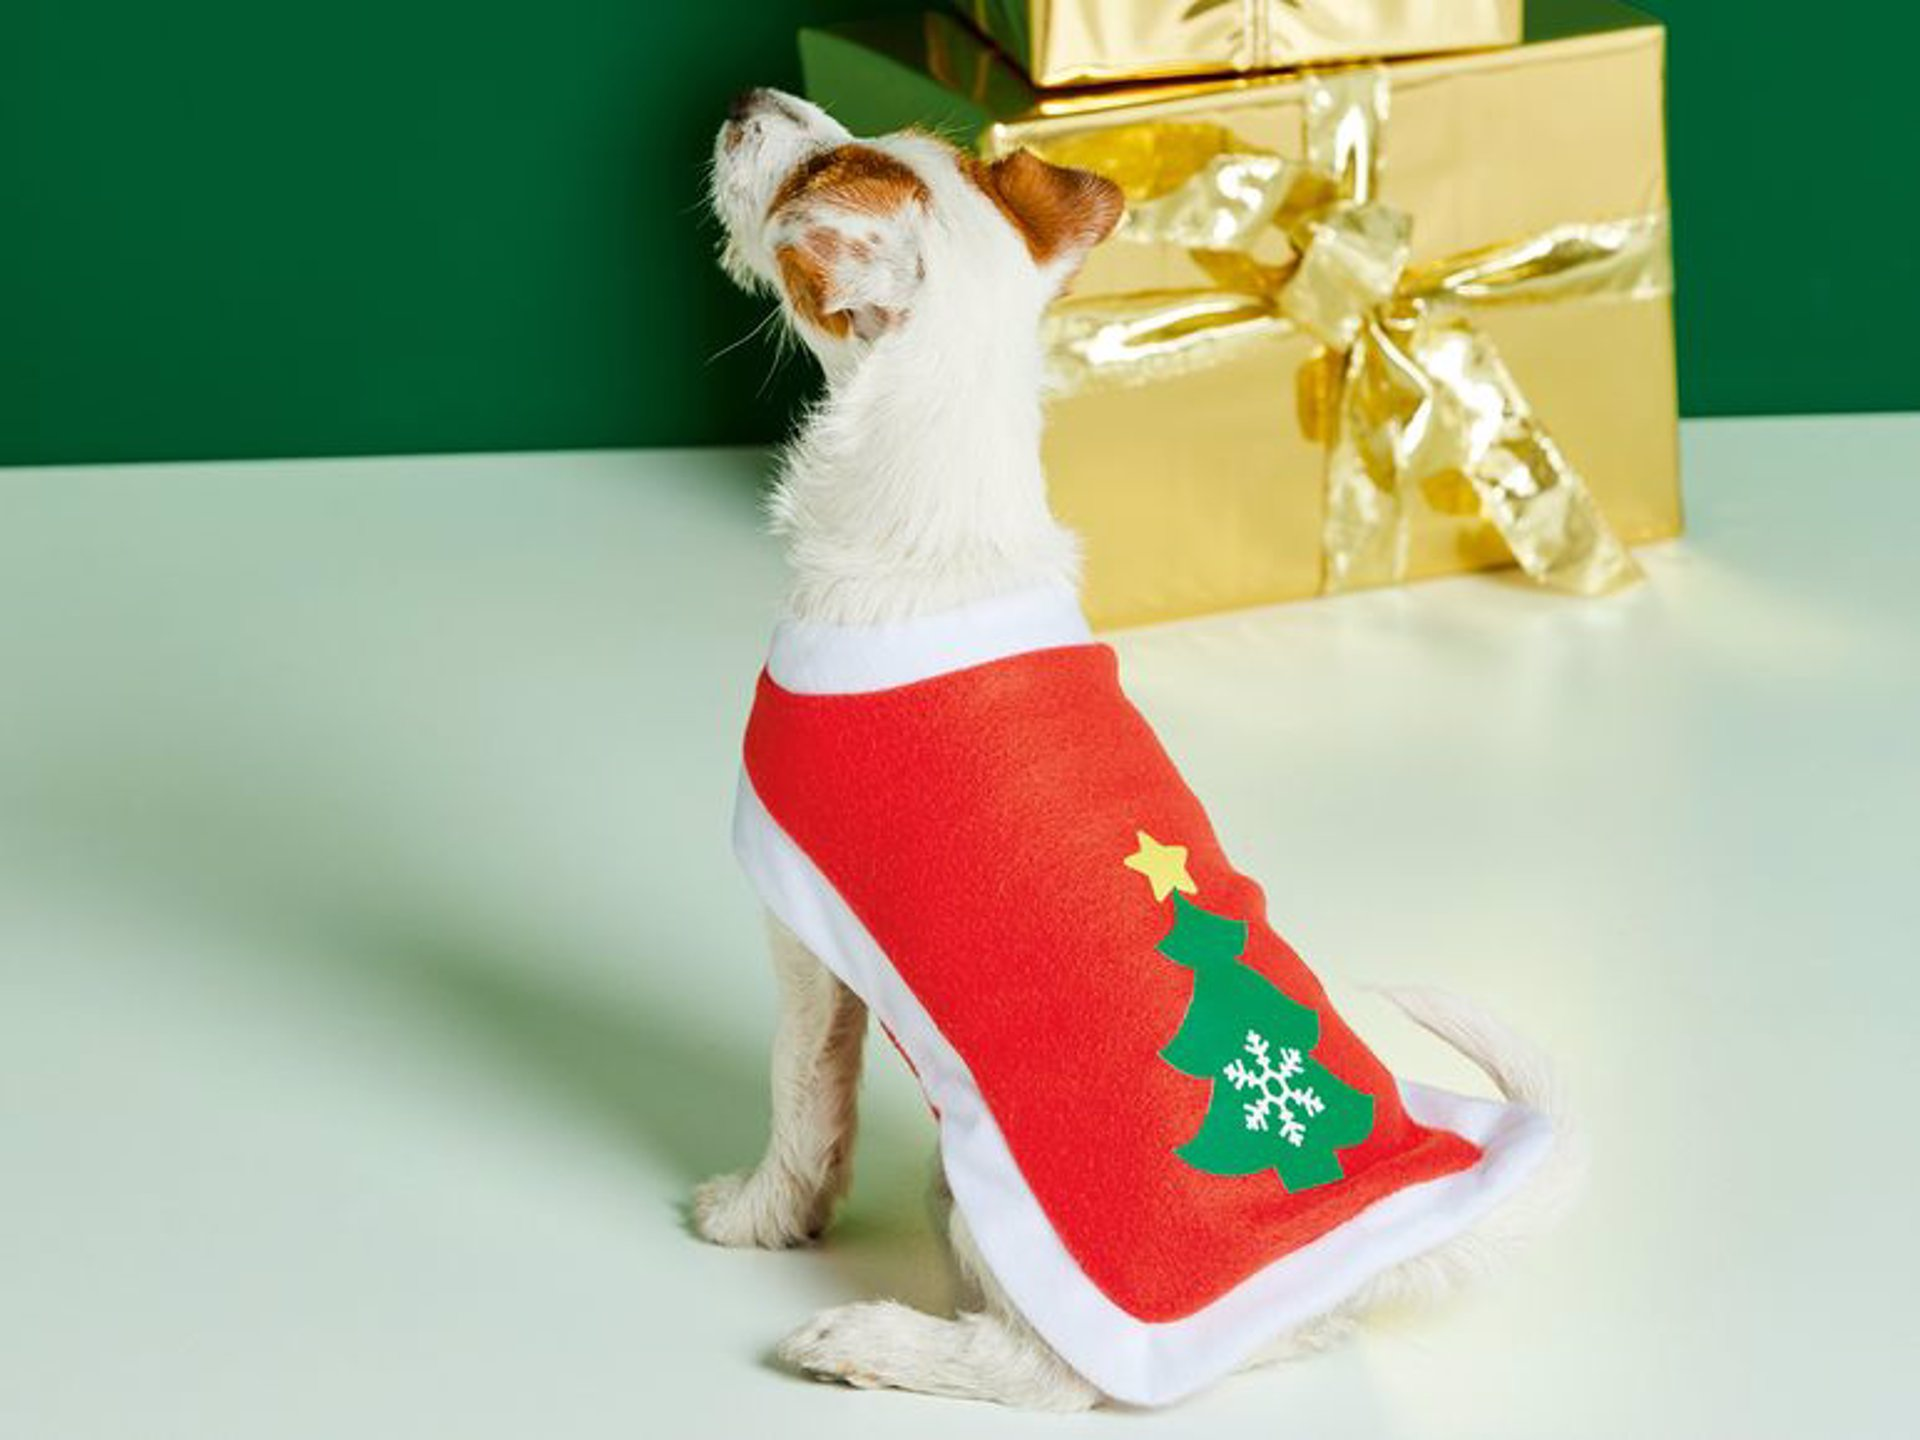 disfraz, traje mascota (perros)  motivos navideños lidl